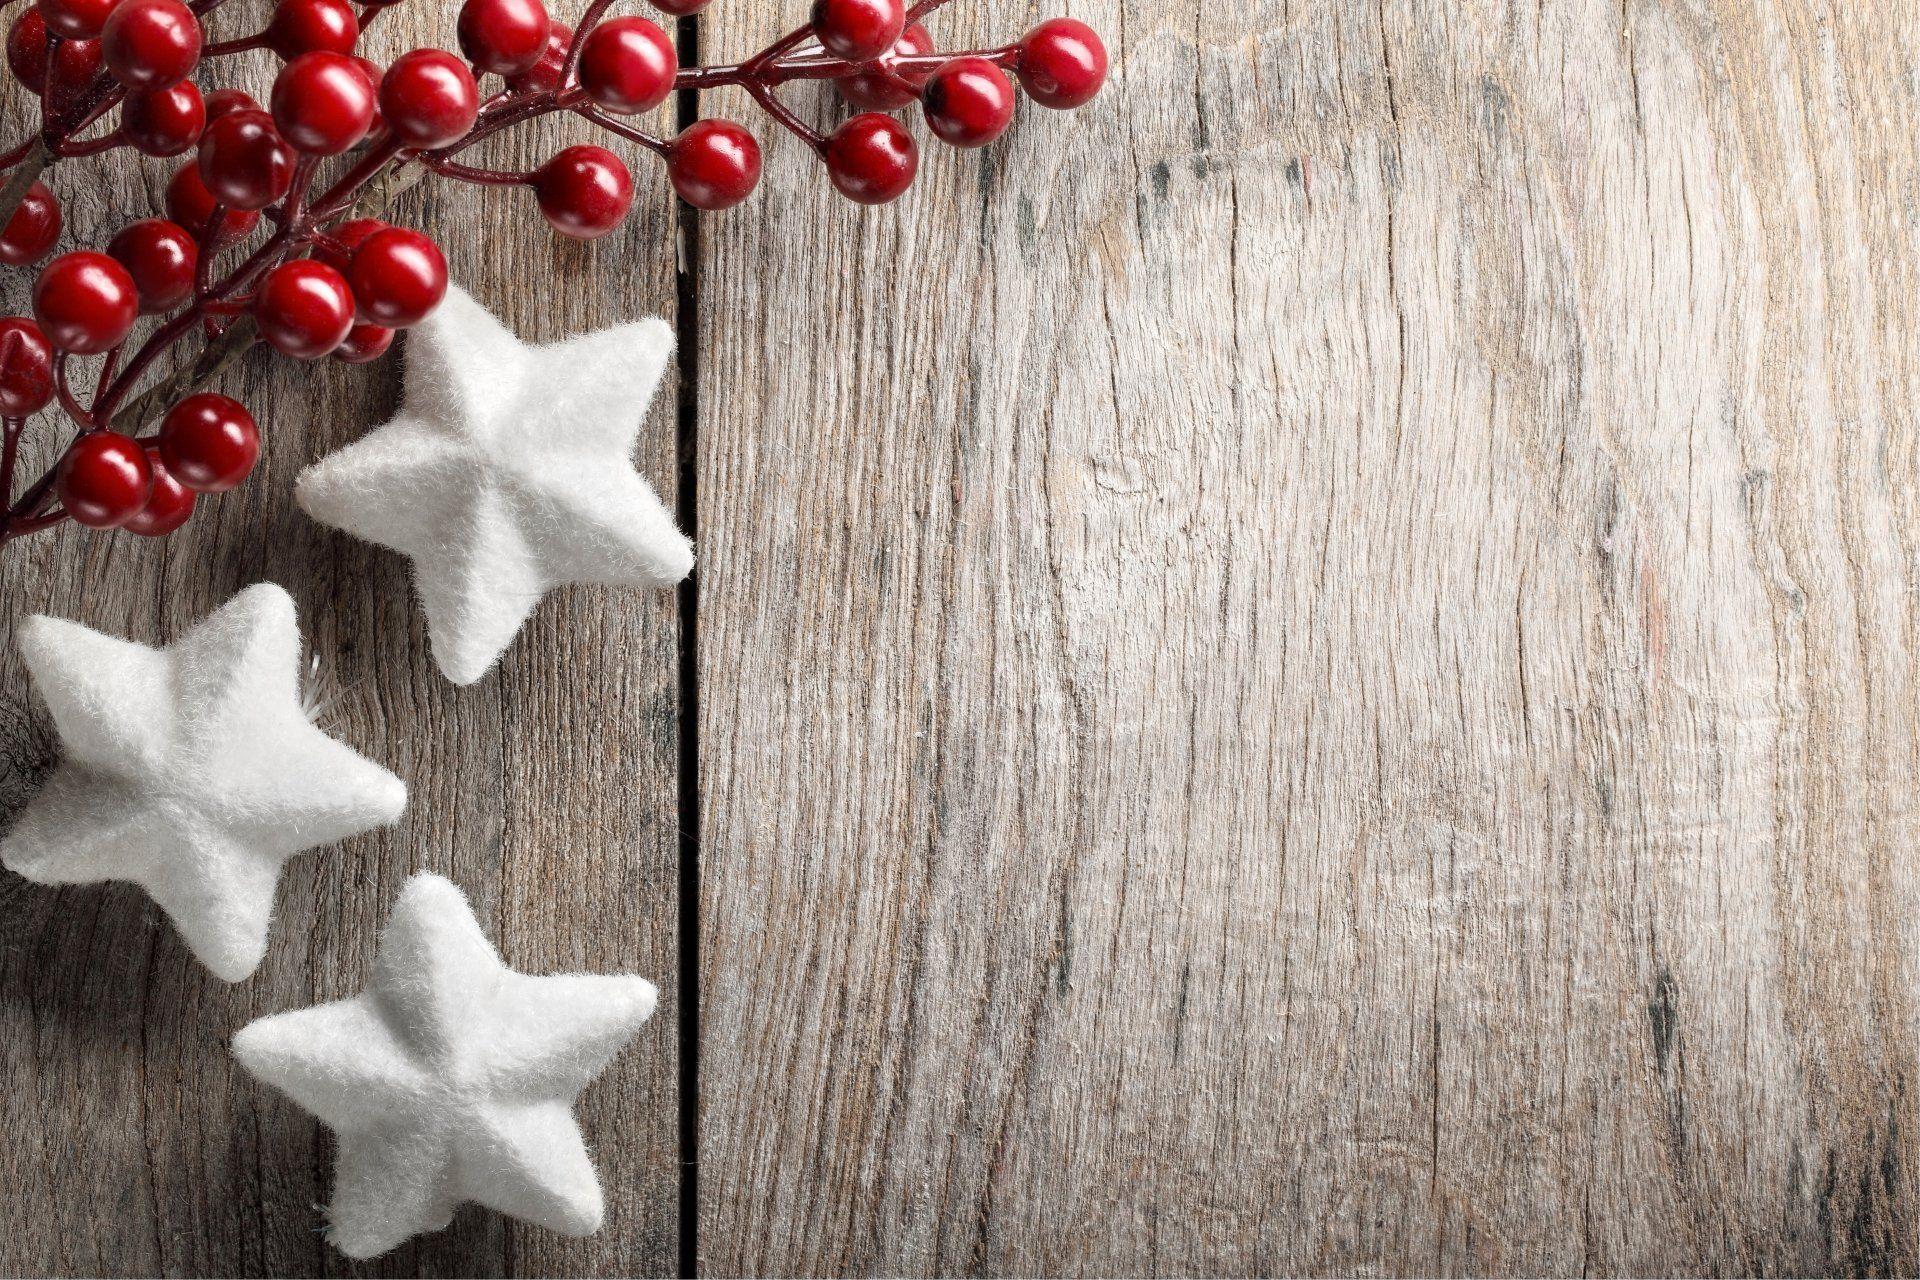 Download Wallpaper Christmas Wood - 4286e65ee570d2f4831005c0c74f5d4d  Collection_25485 .jpg